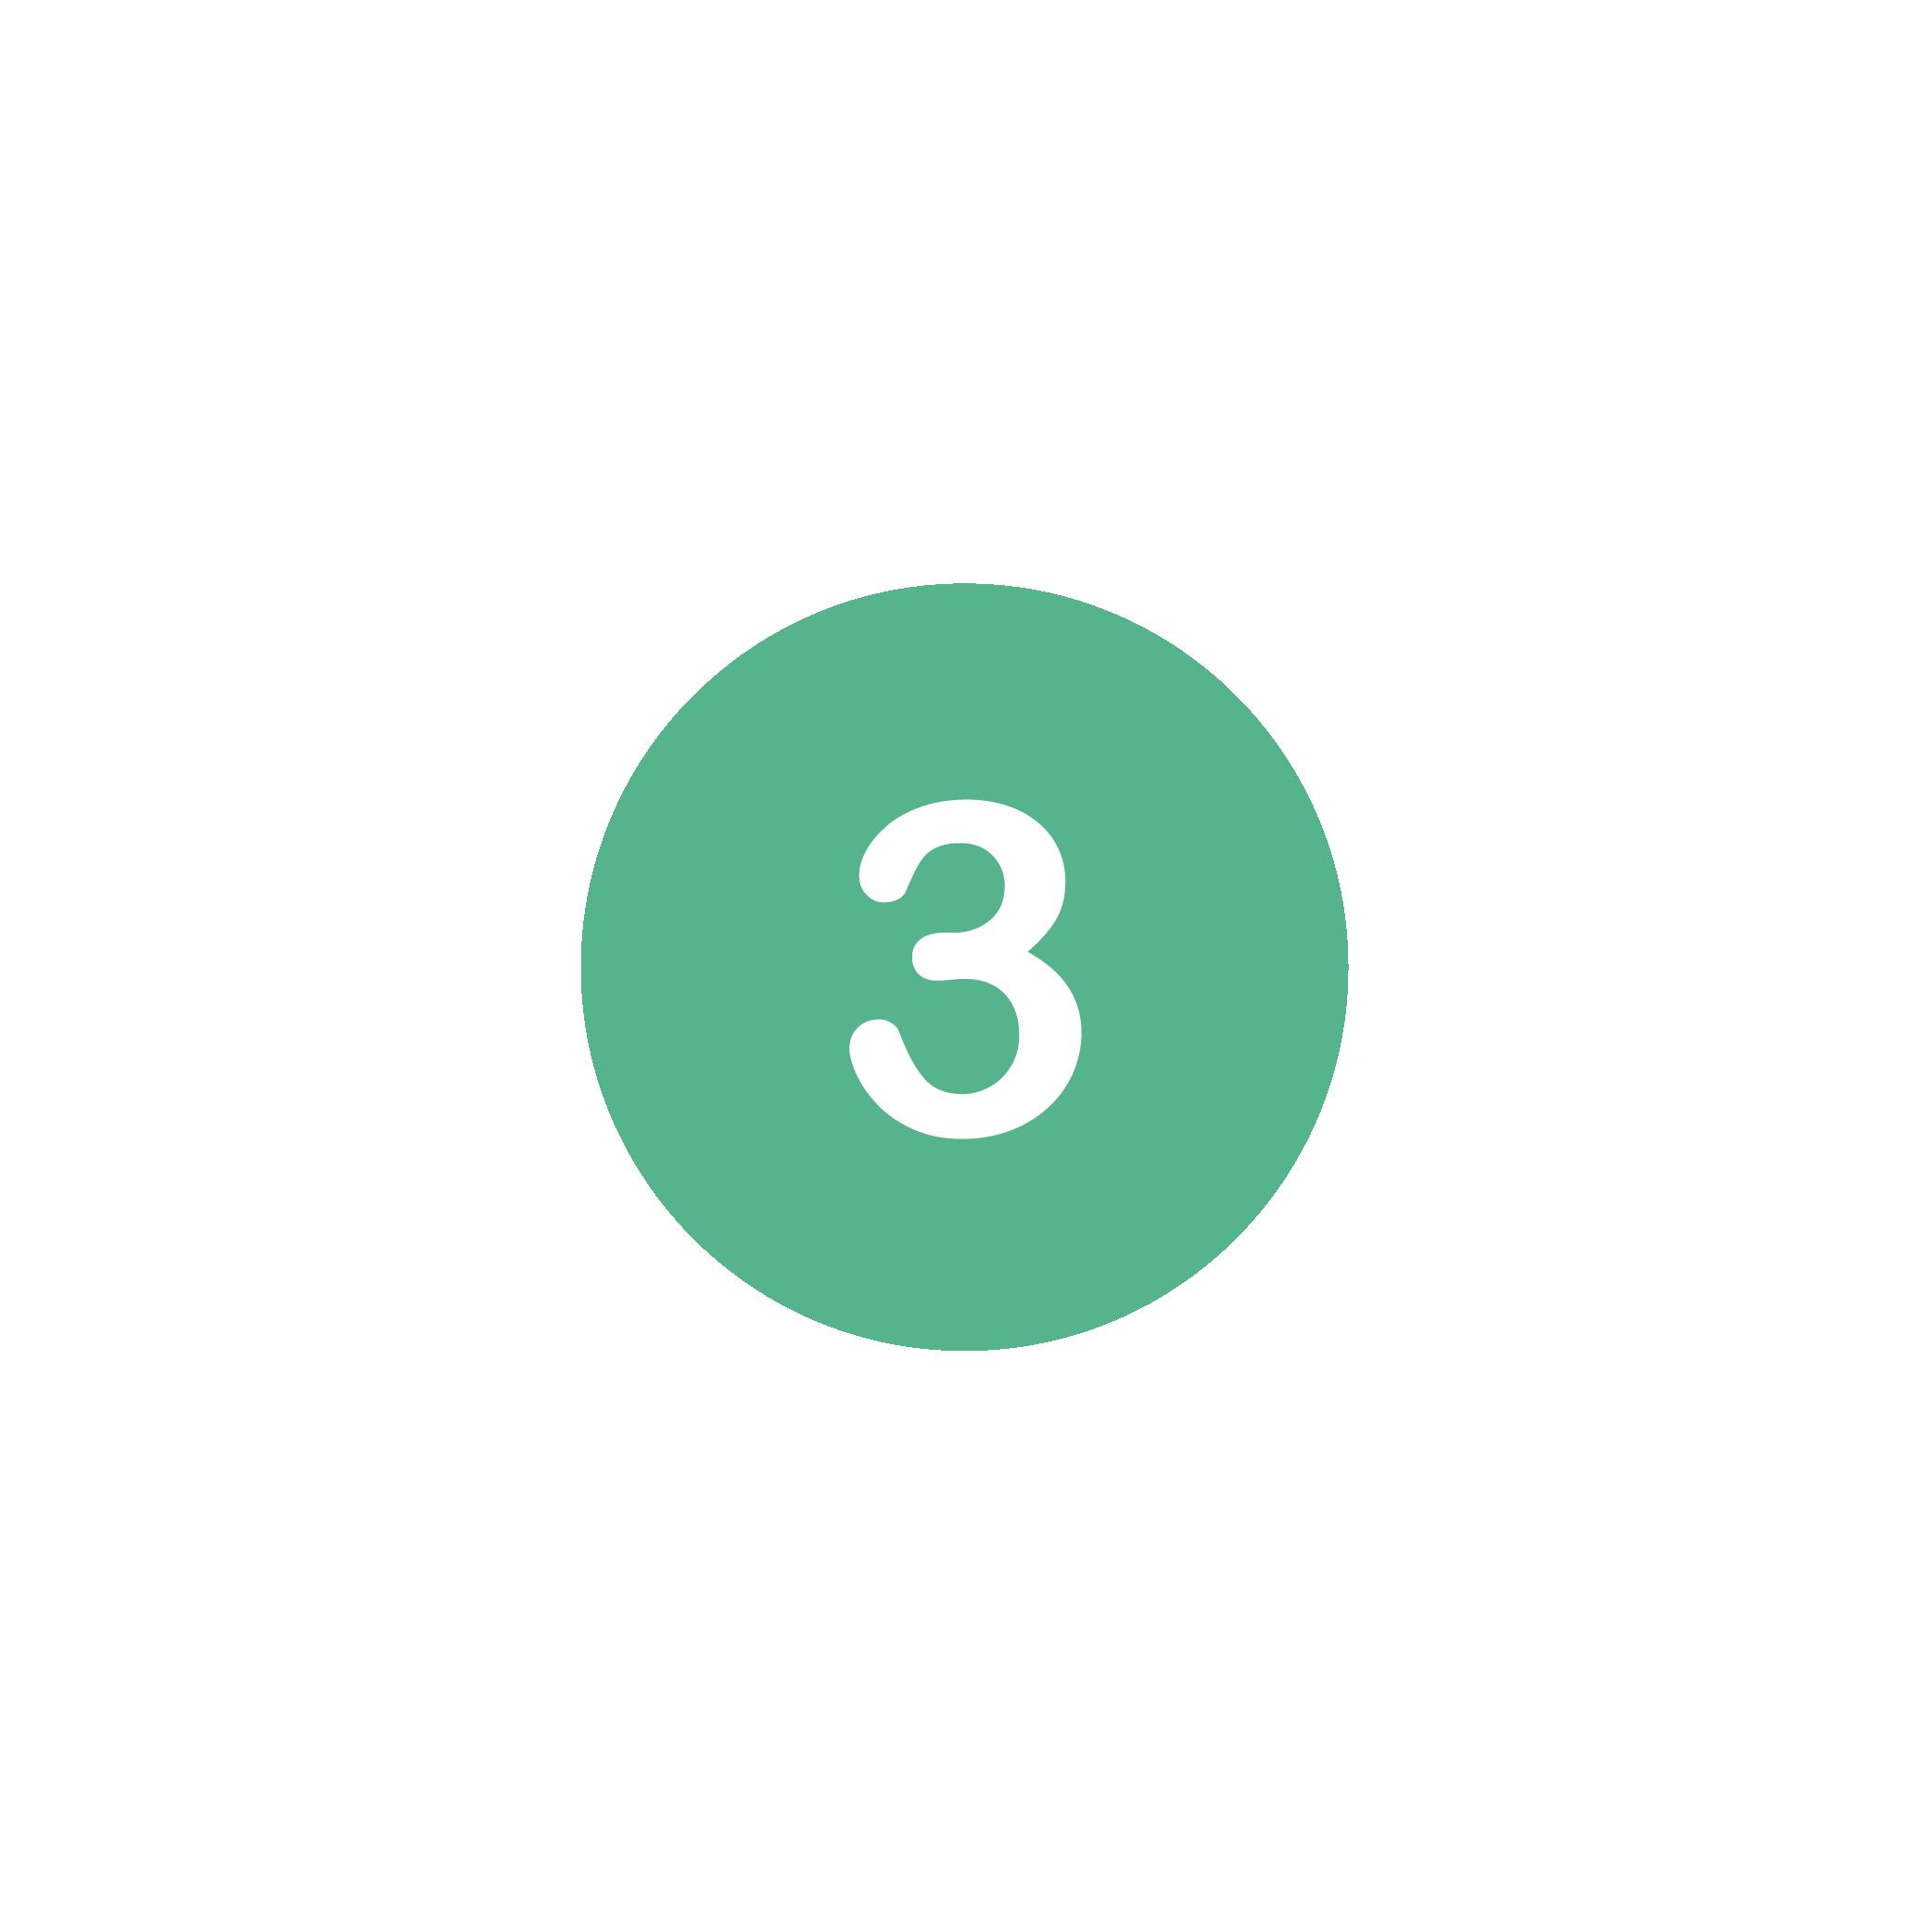 003-three-01.png